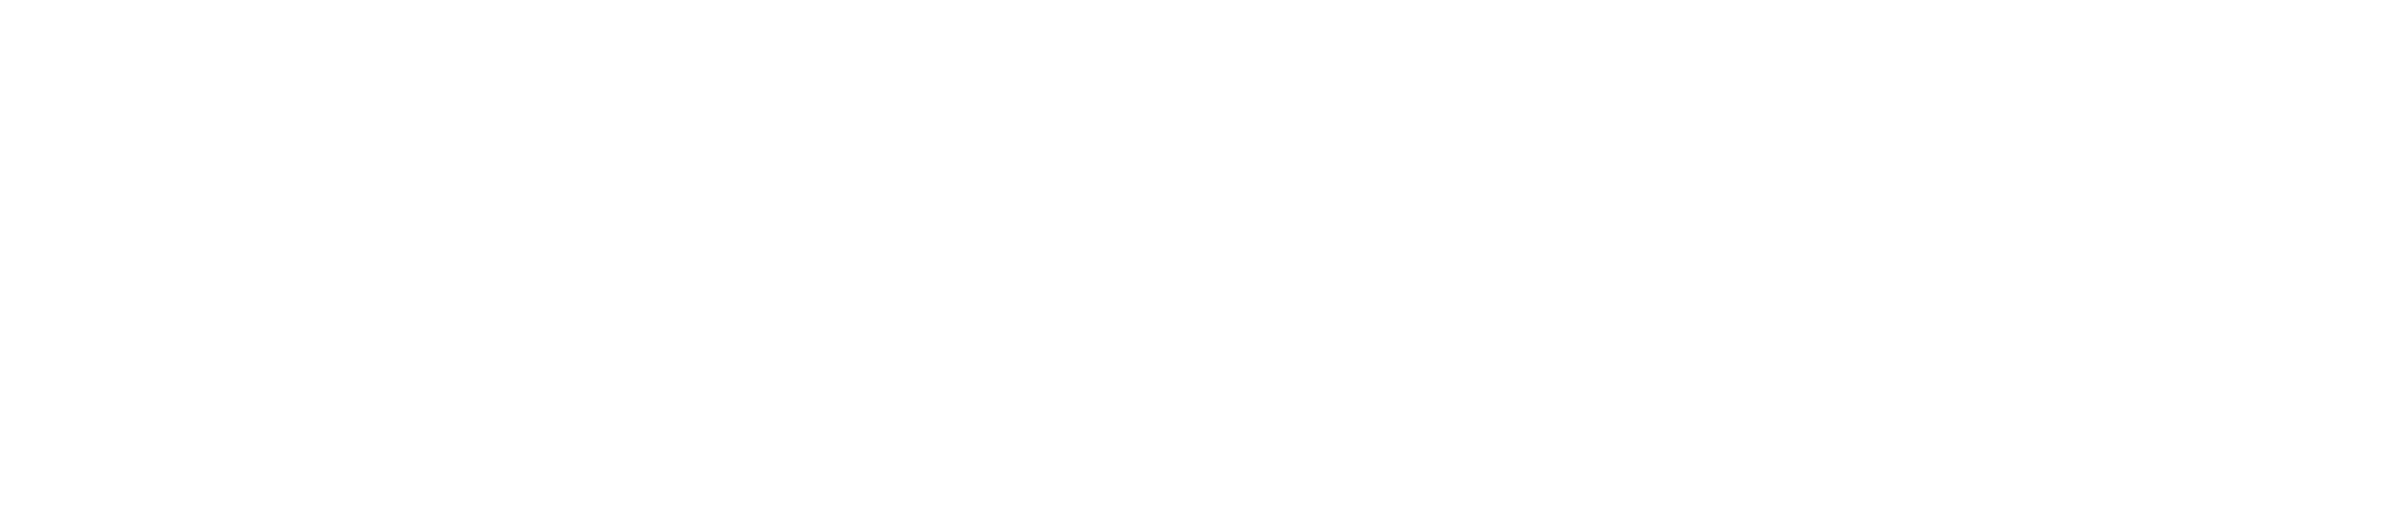 Revlon-logo-png-transparent - Ec Labs - Revlon Logo PNG